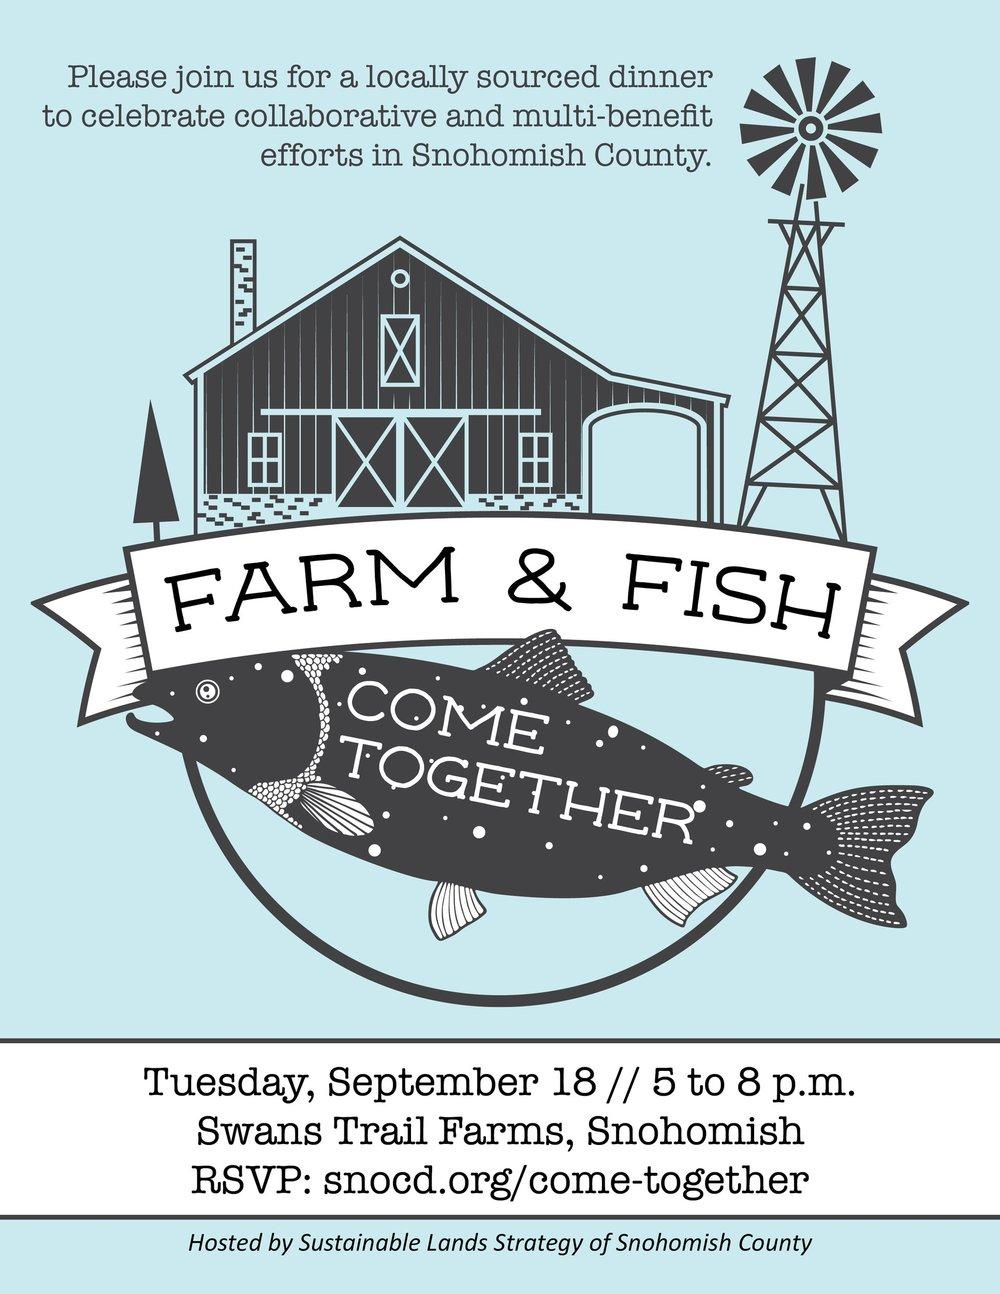 farm&Fish_AltSalmon.jpg